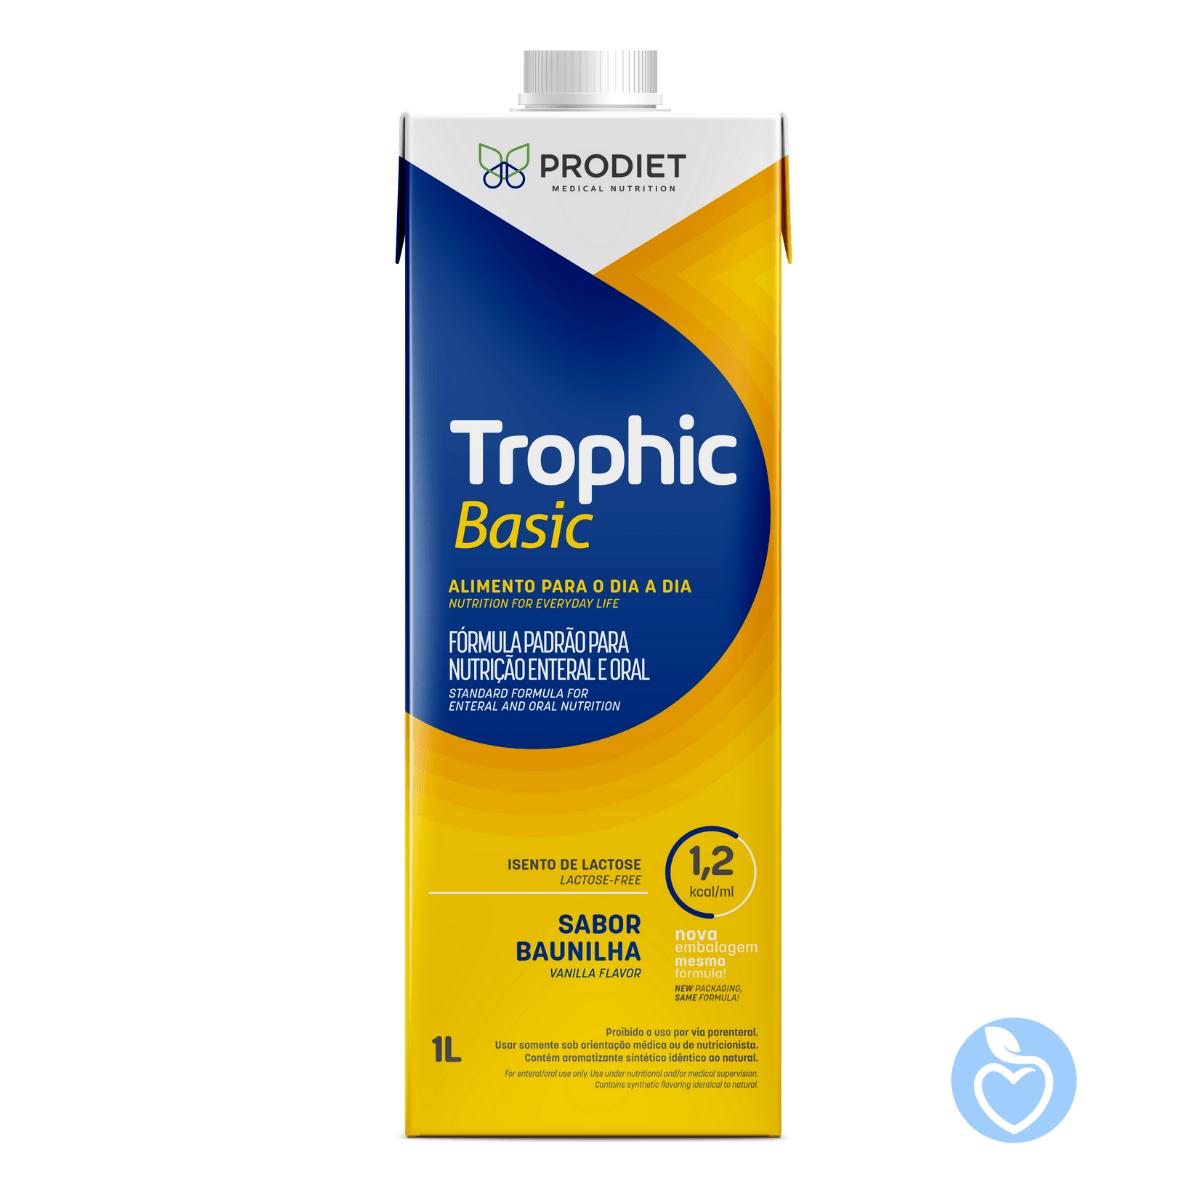 Trophic Basic 1.2 Kcal - 1000 ml